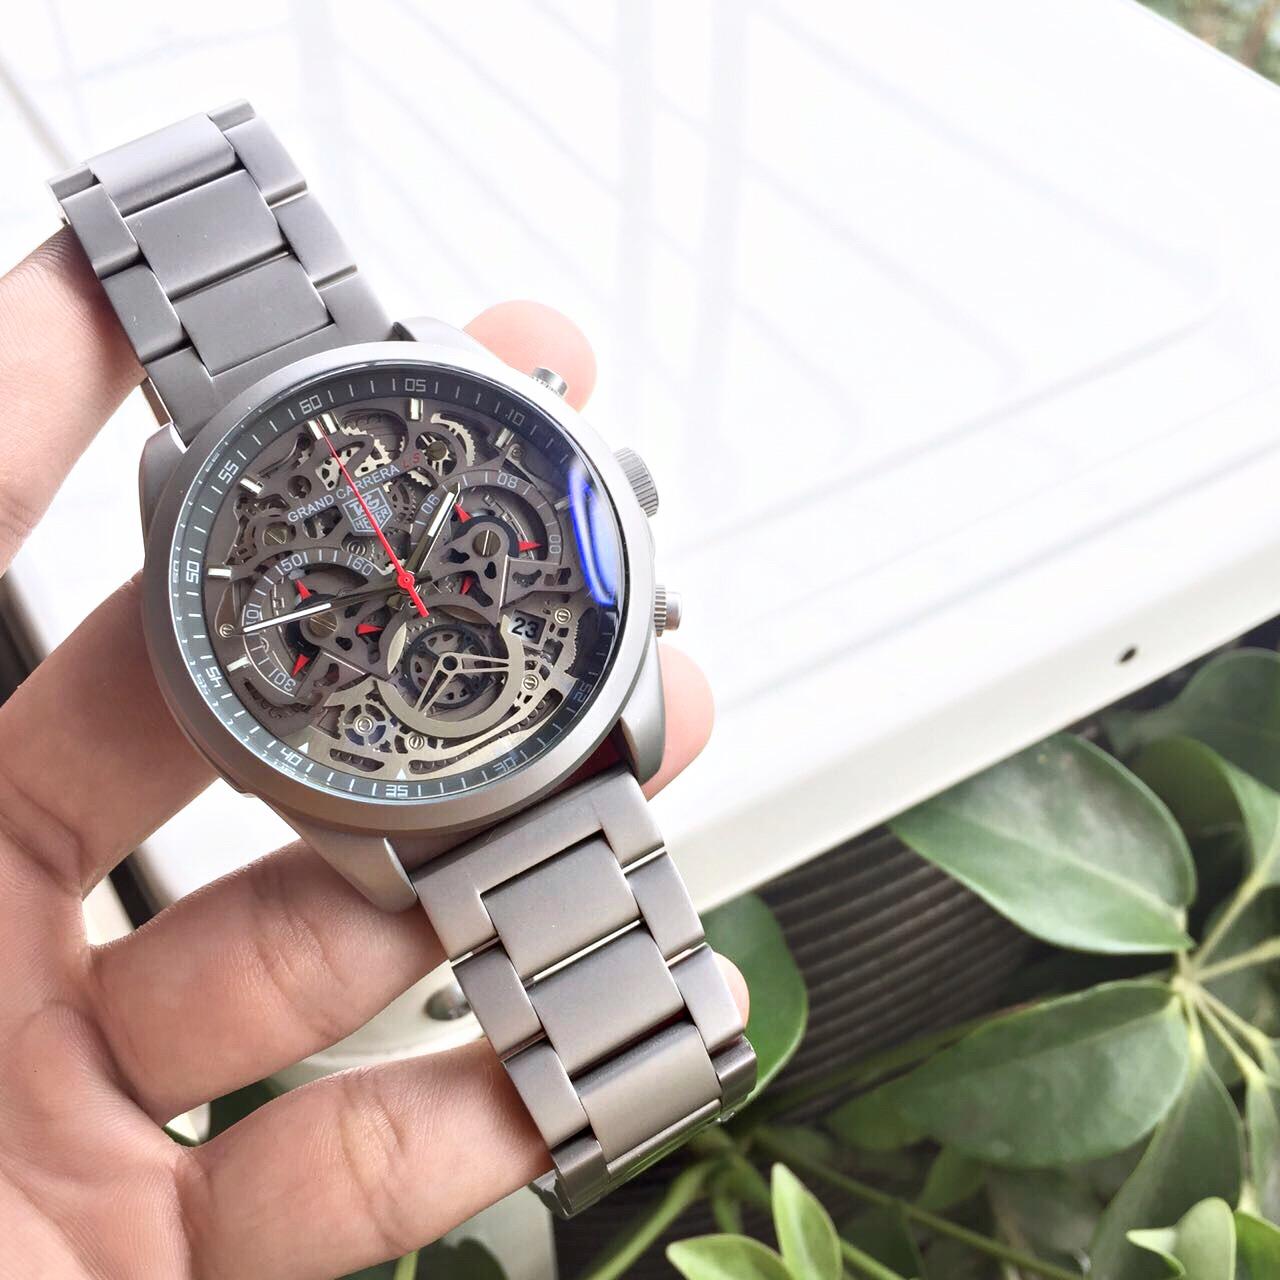 c311681d82c12 Rolex Daytona Ice Blue Watch Price Rs2999 FREE SHIPPING Auto Chrono ...